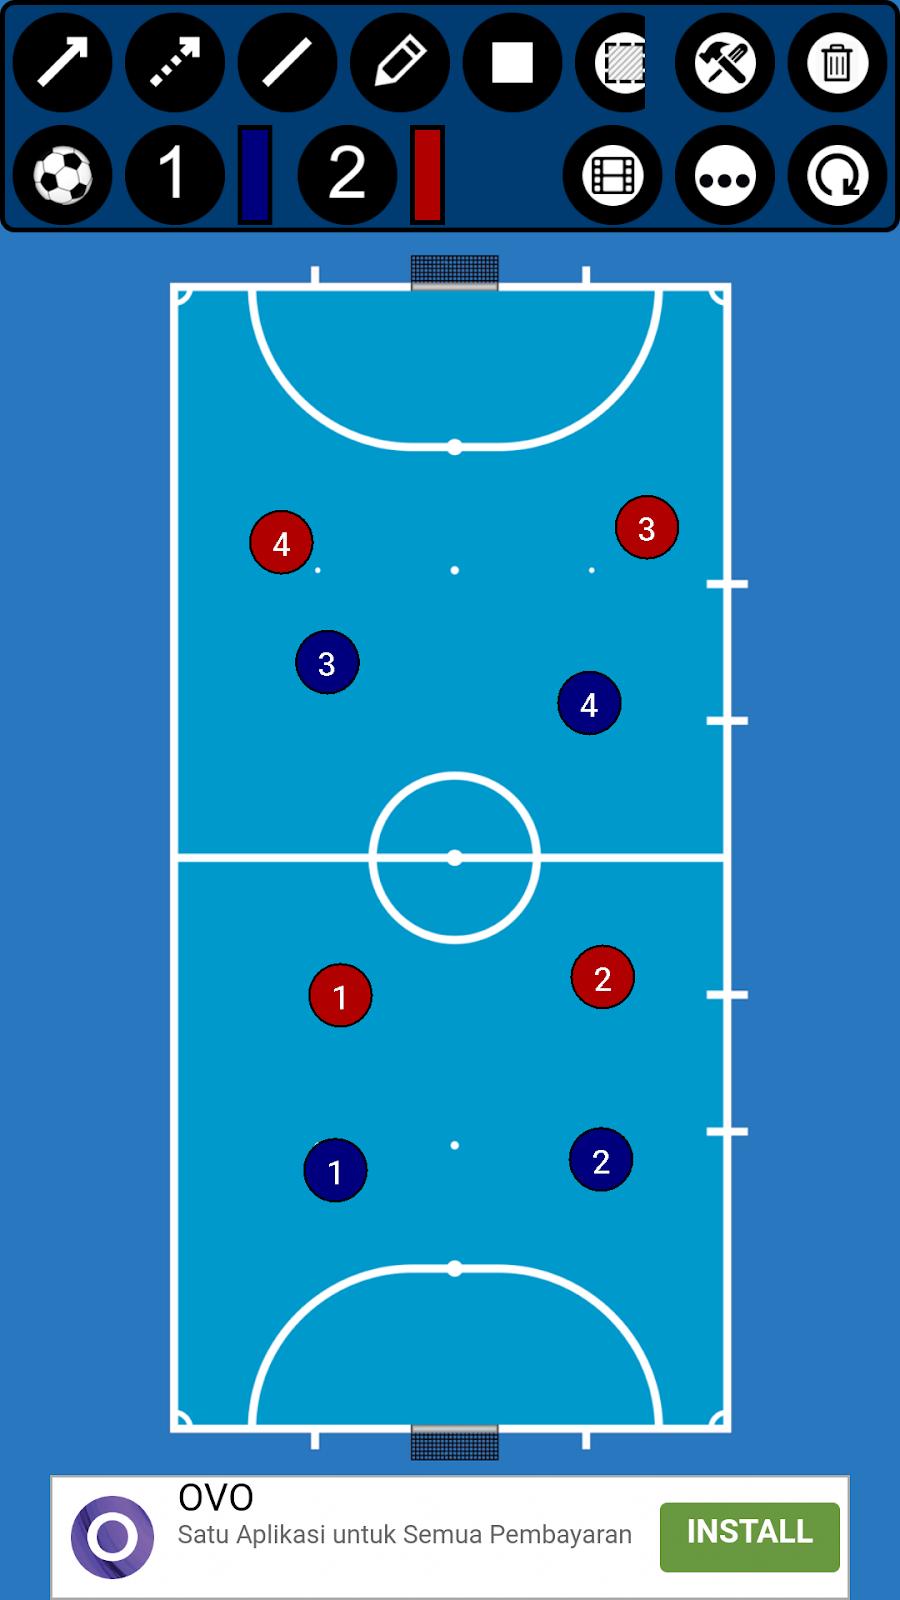 Formasi Futsal Bertahan : formasi, futsal, bertahan, Formasi, Futsal: